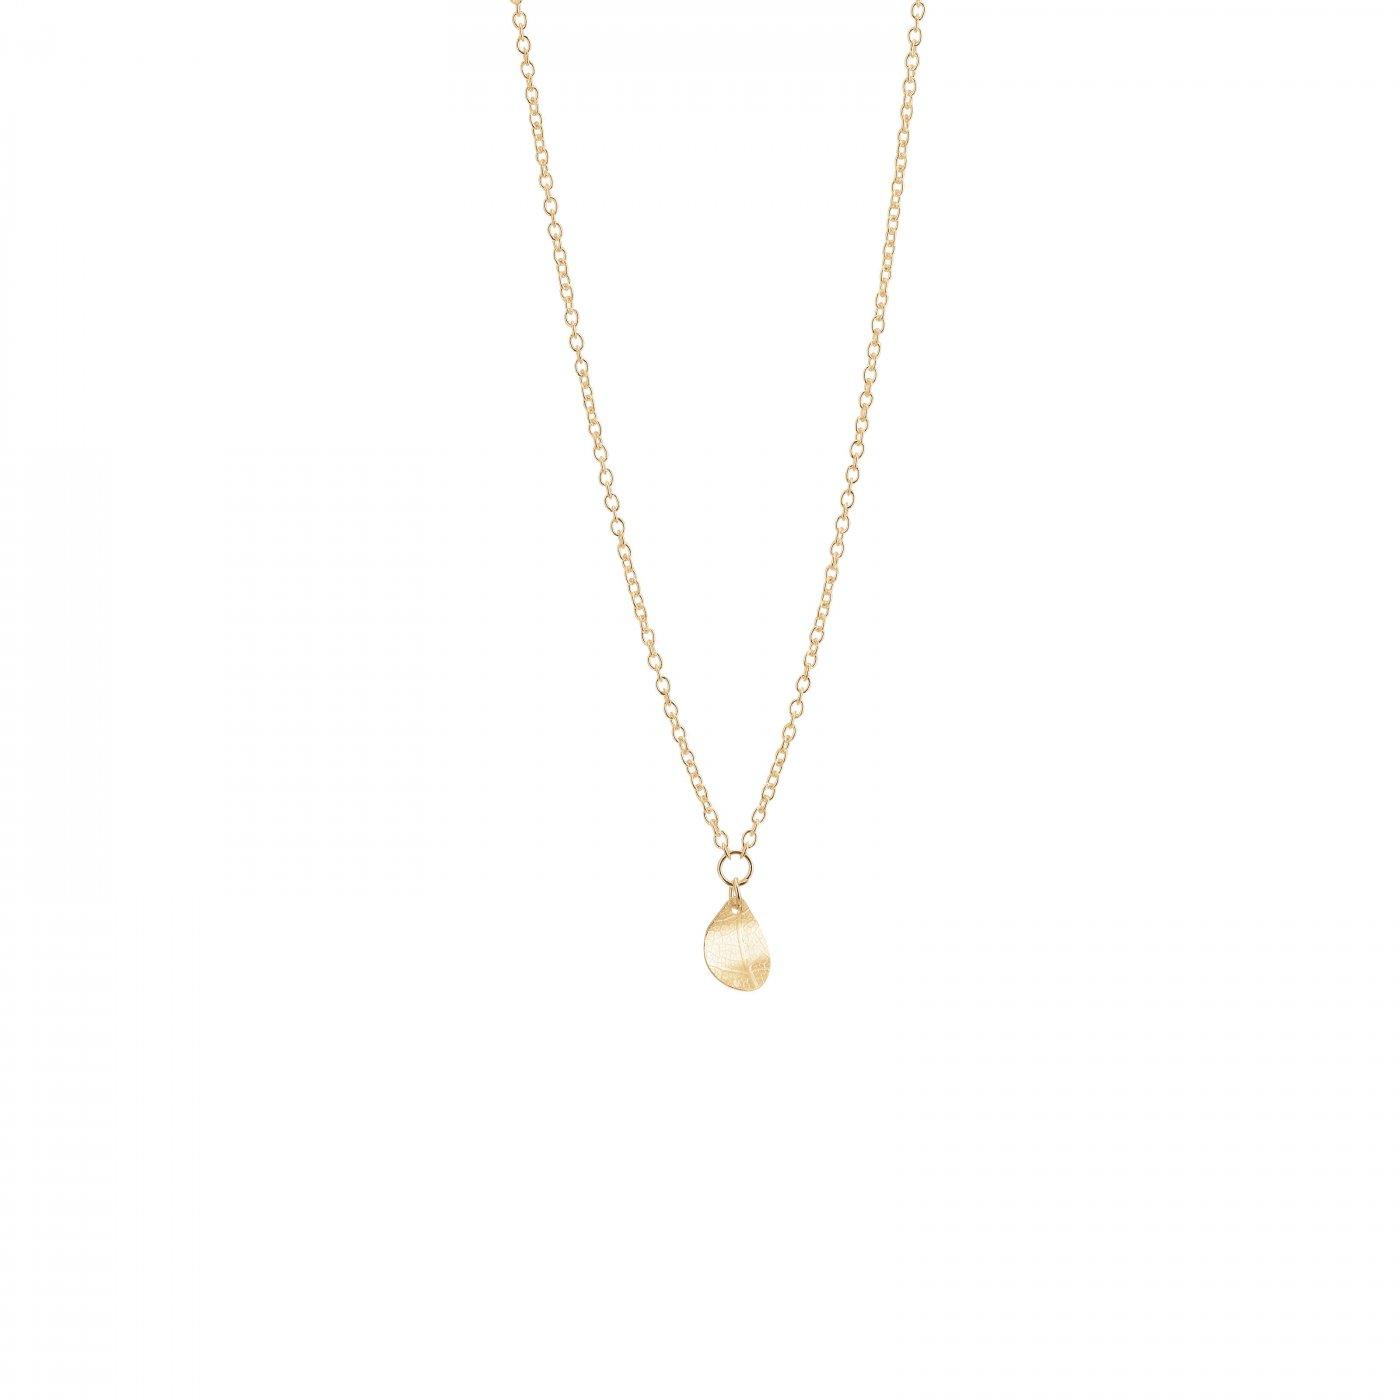 Leaf-drop-necklace-gold-zoom-1400x1400